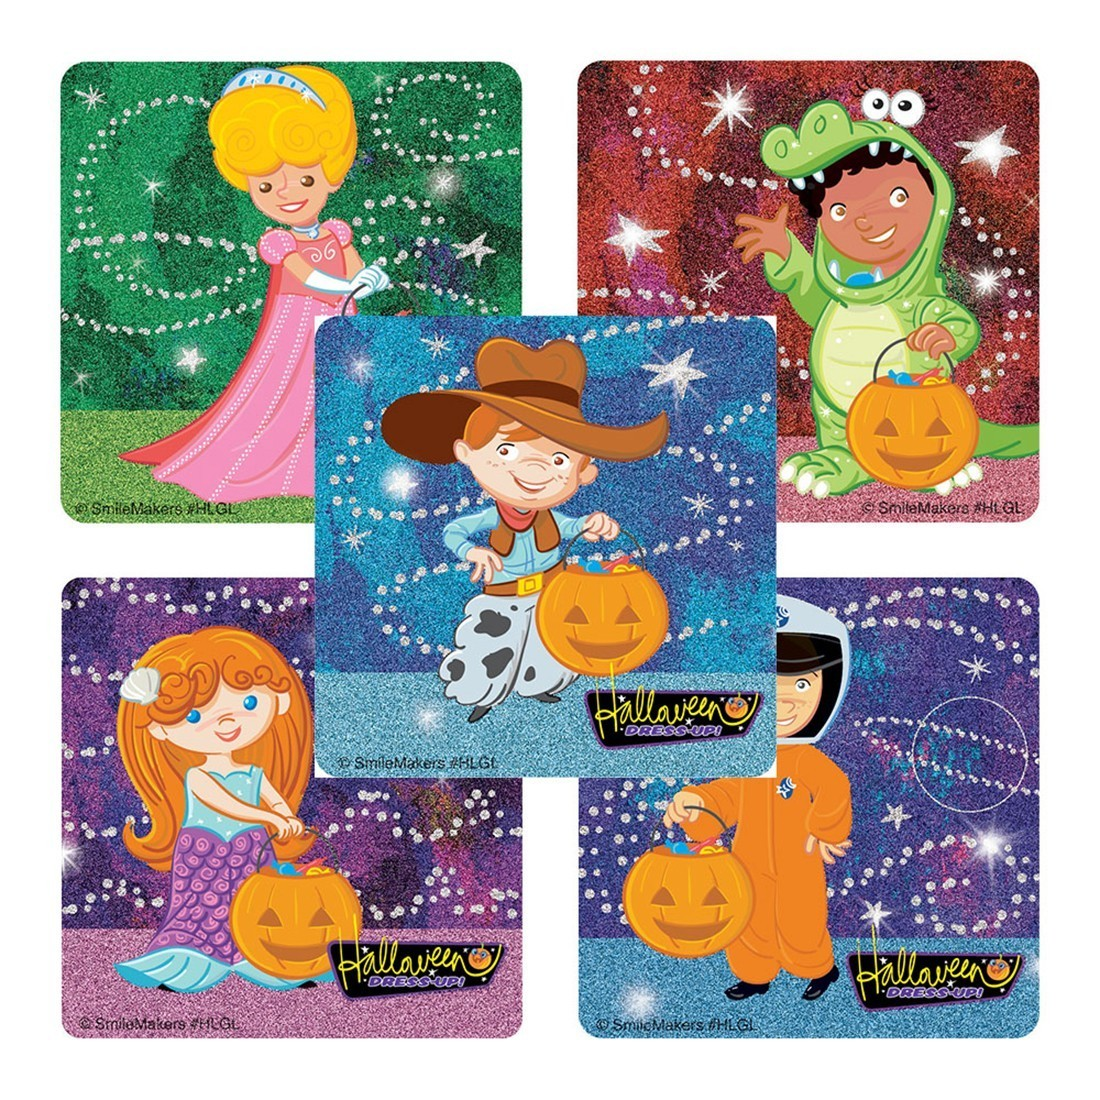 Halloween Glitter Stickers                         [image]